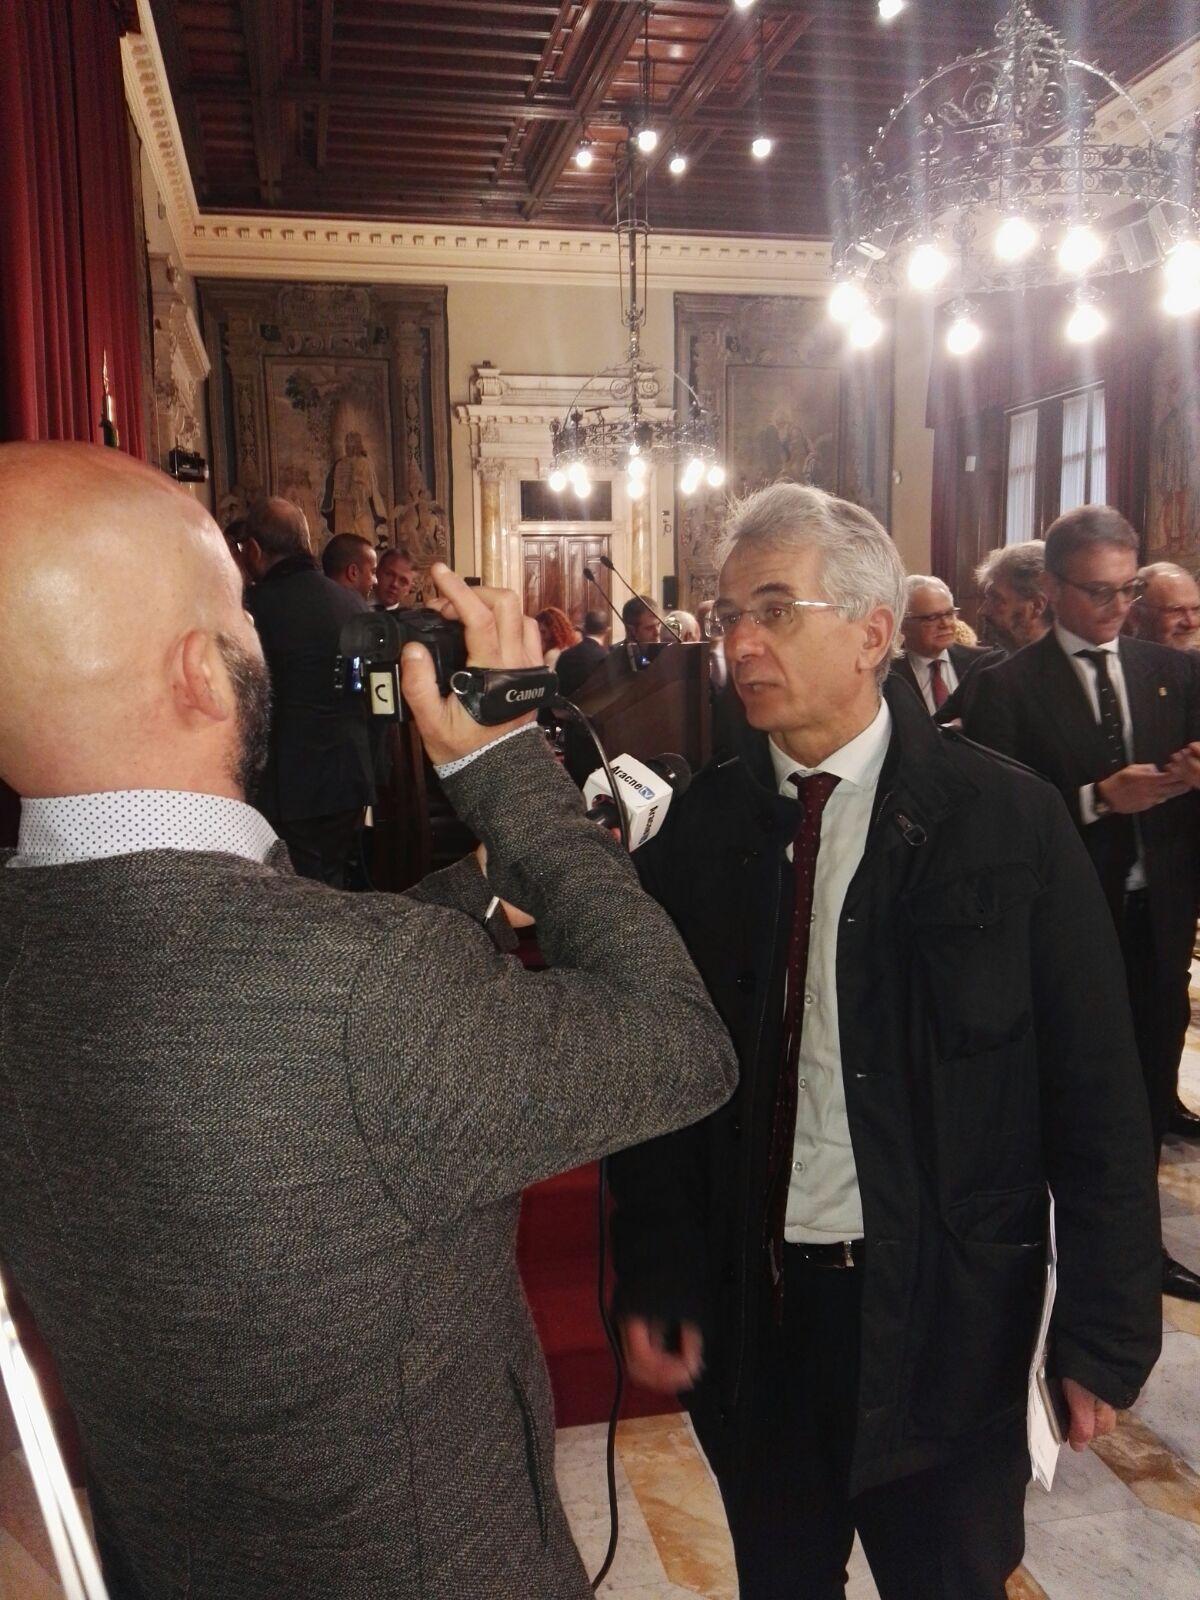 CosimoMaria Ferri